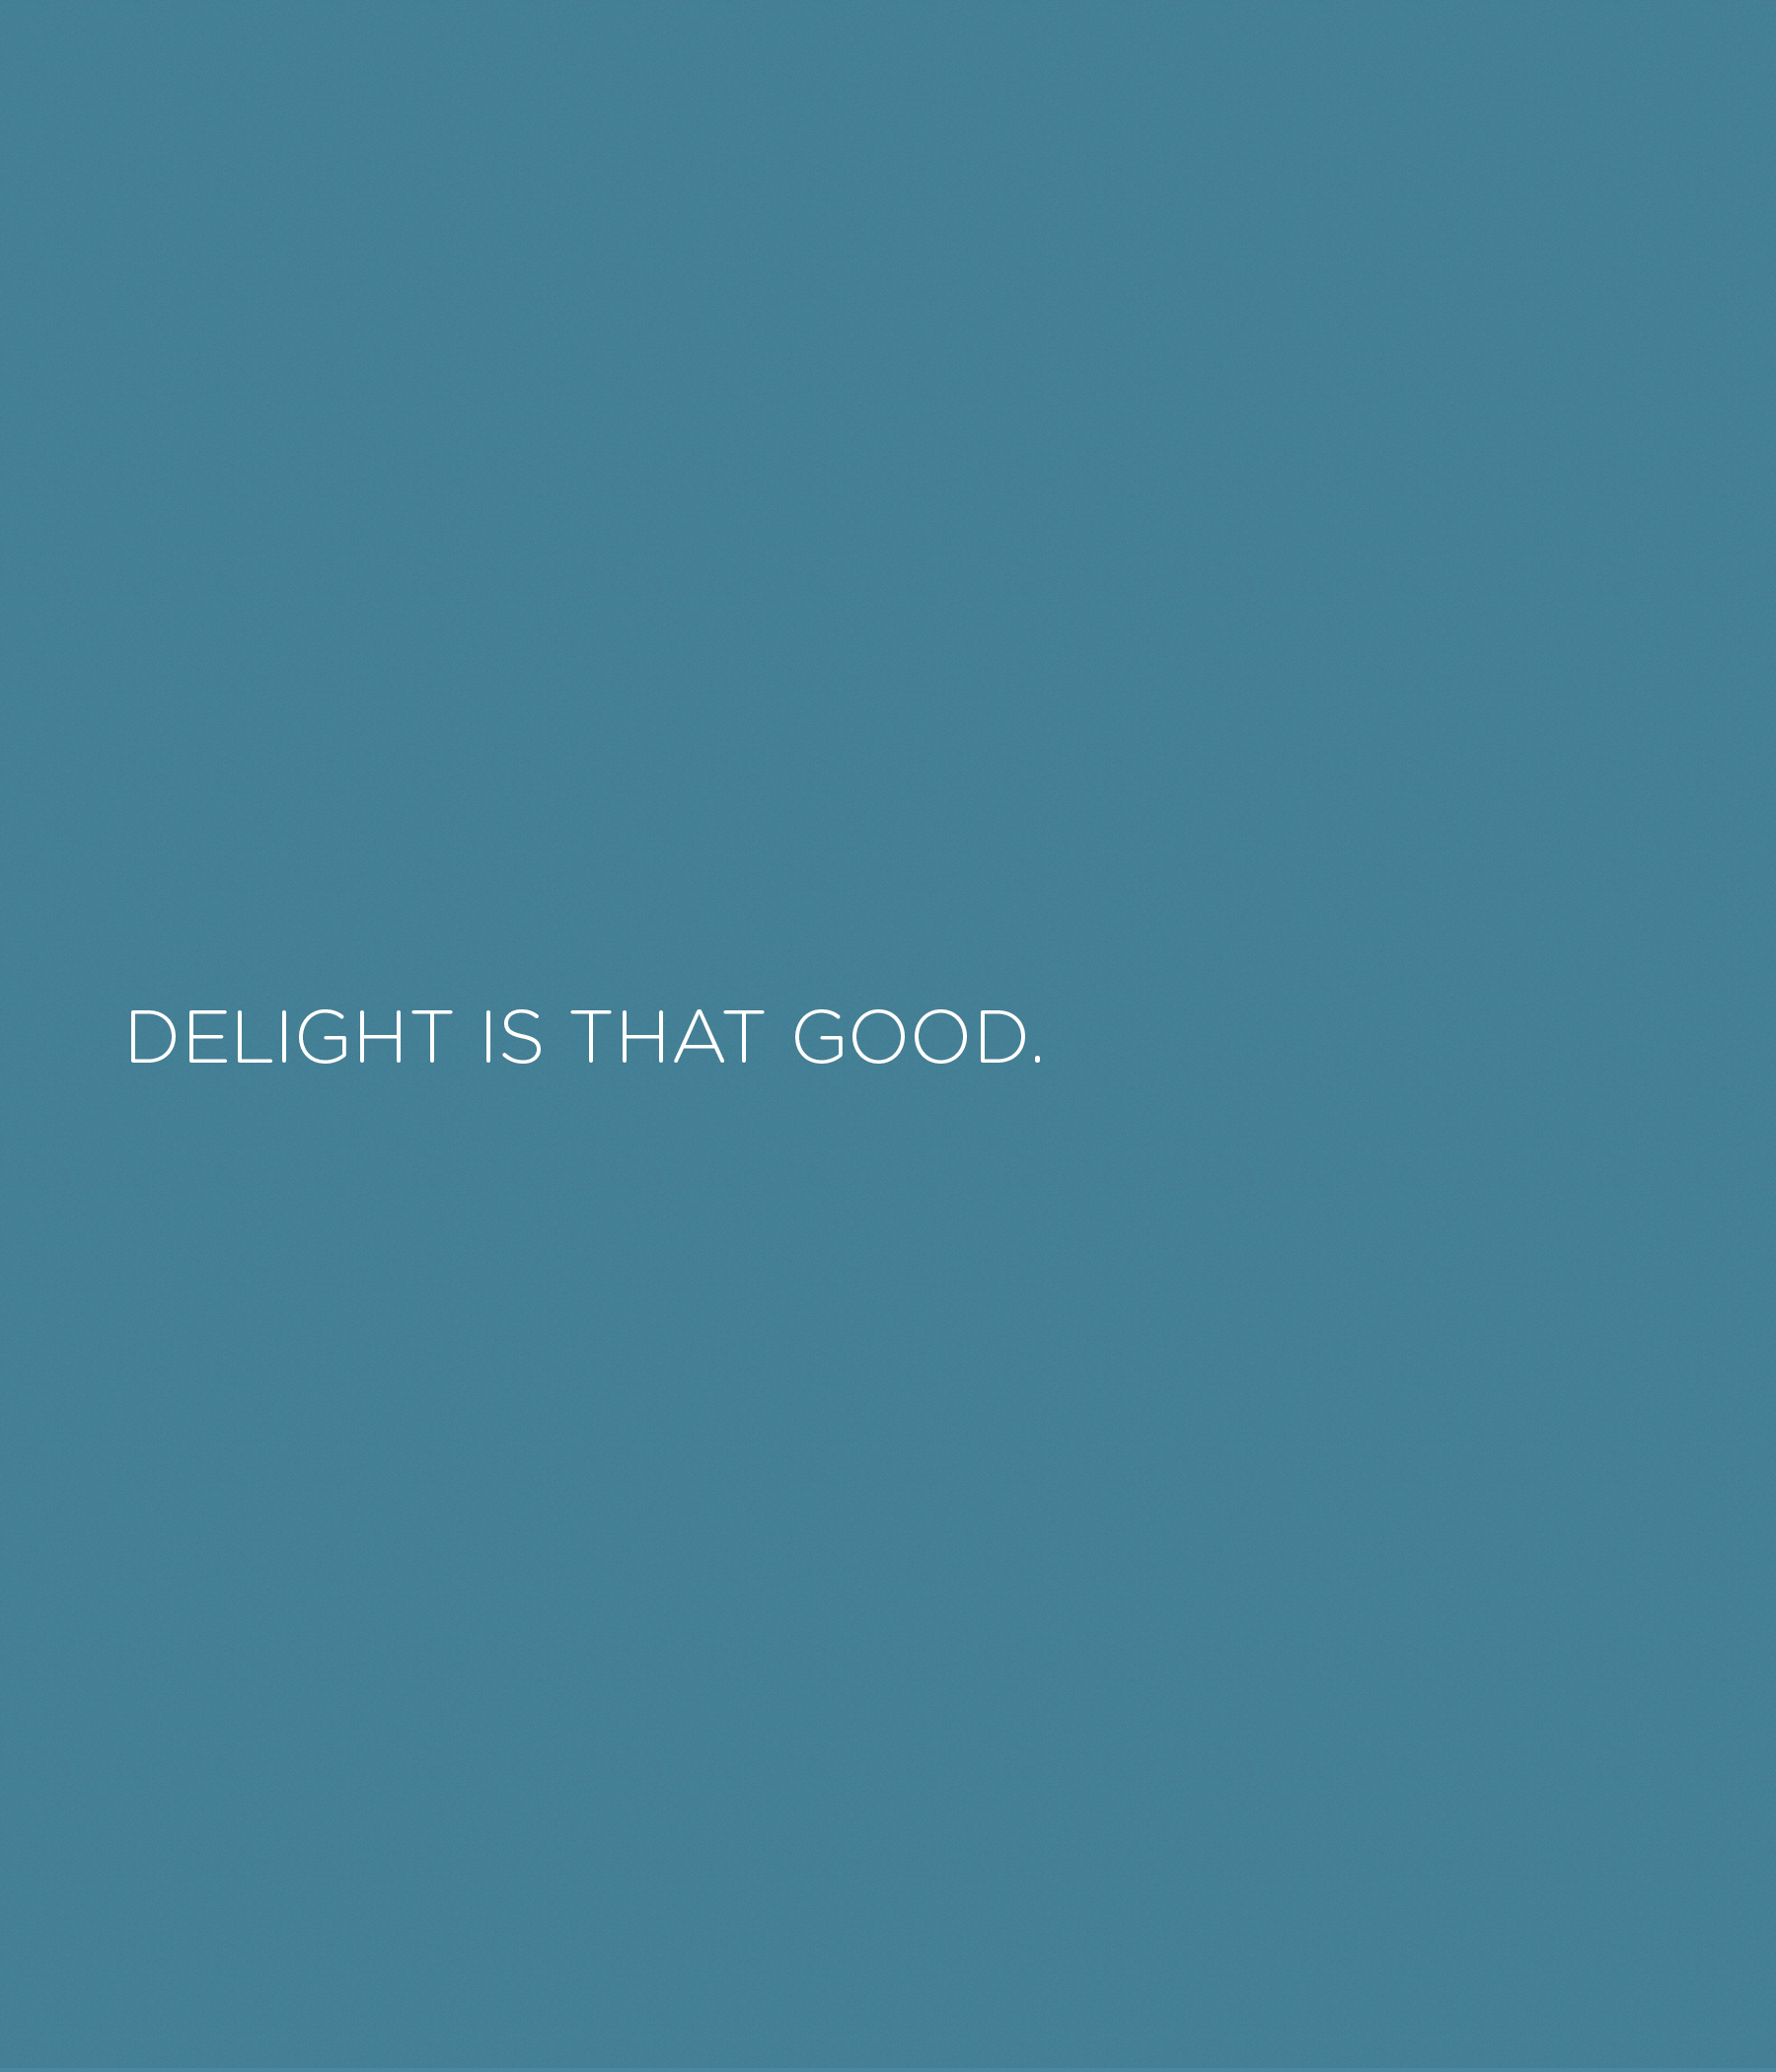 delight_manifesto_0025_Layer Comp 26.jpg